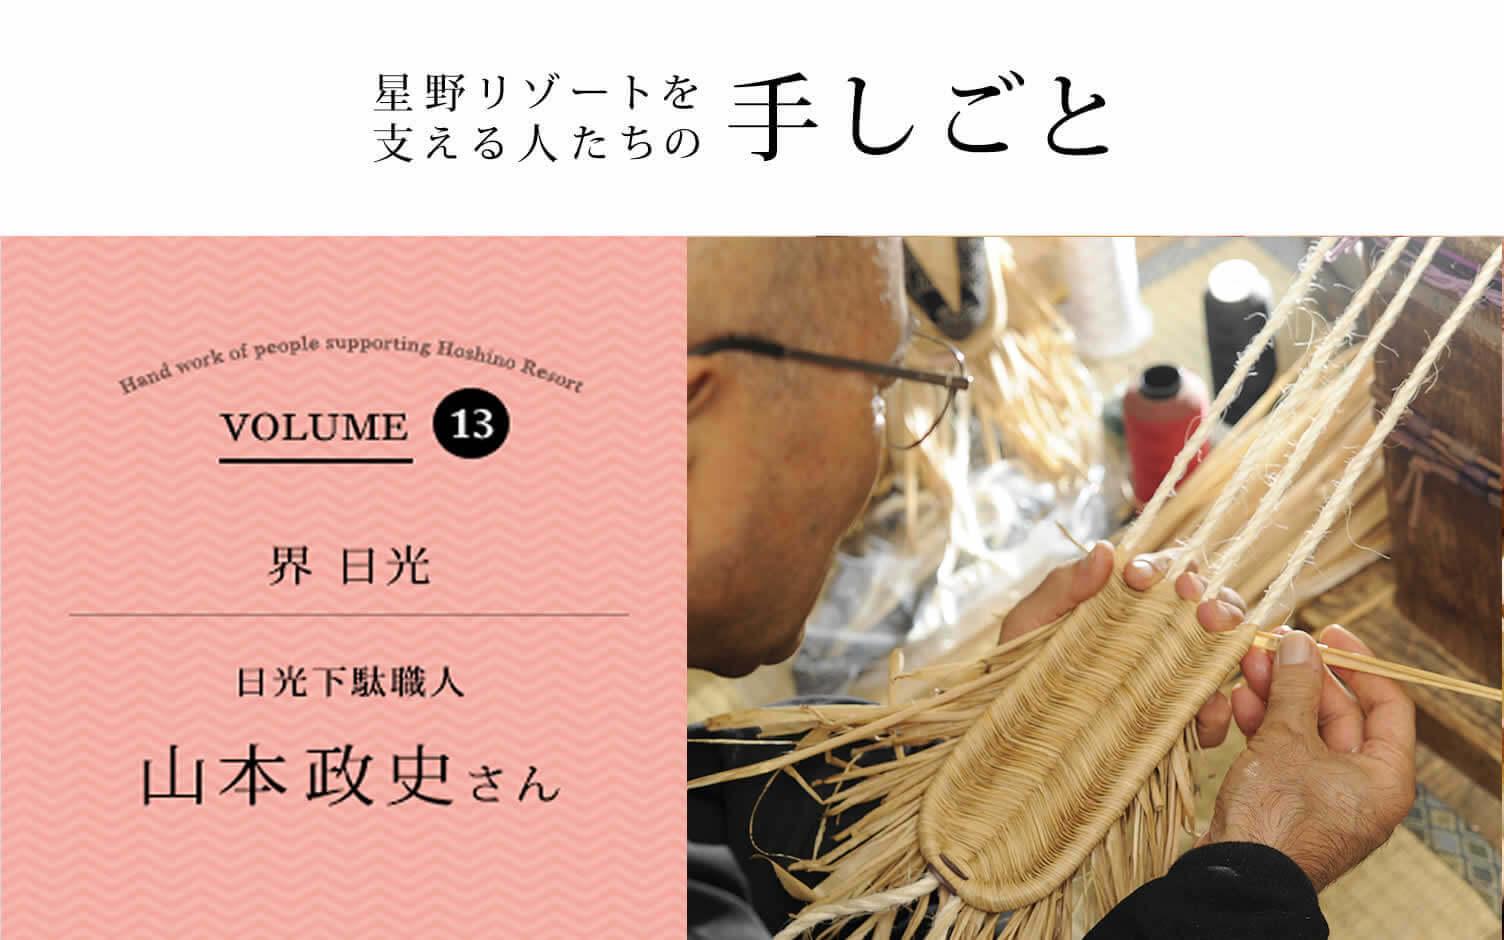 vol.13 日光下駄職人 山本政史さん